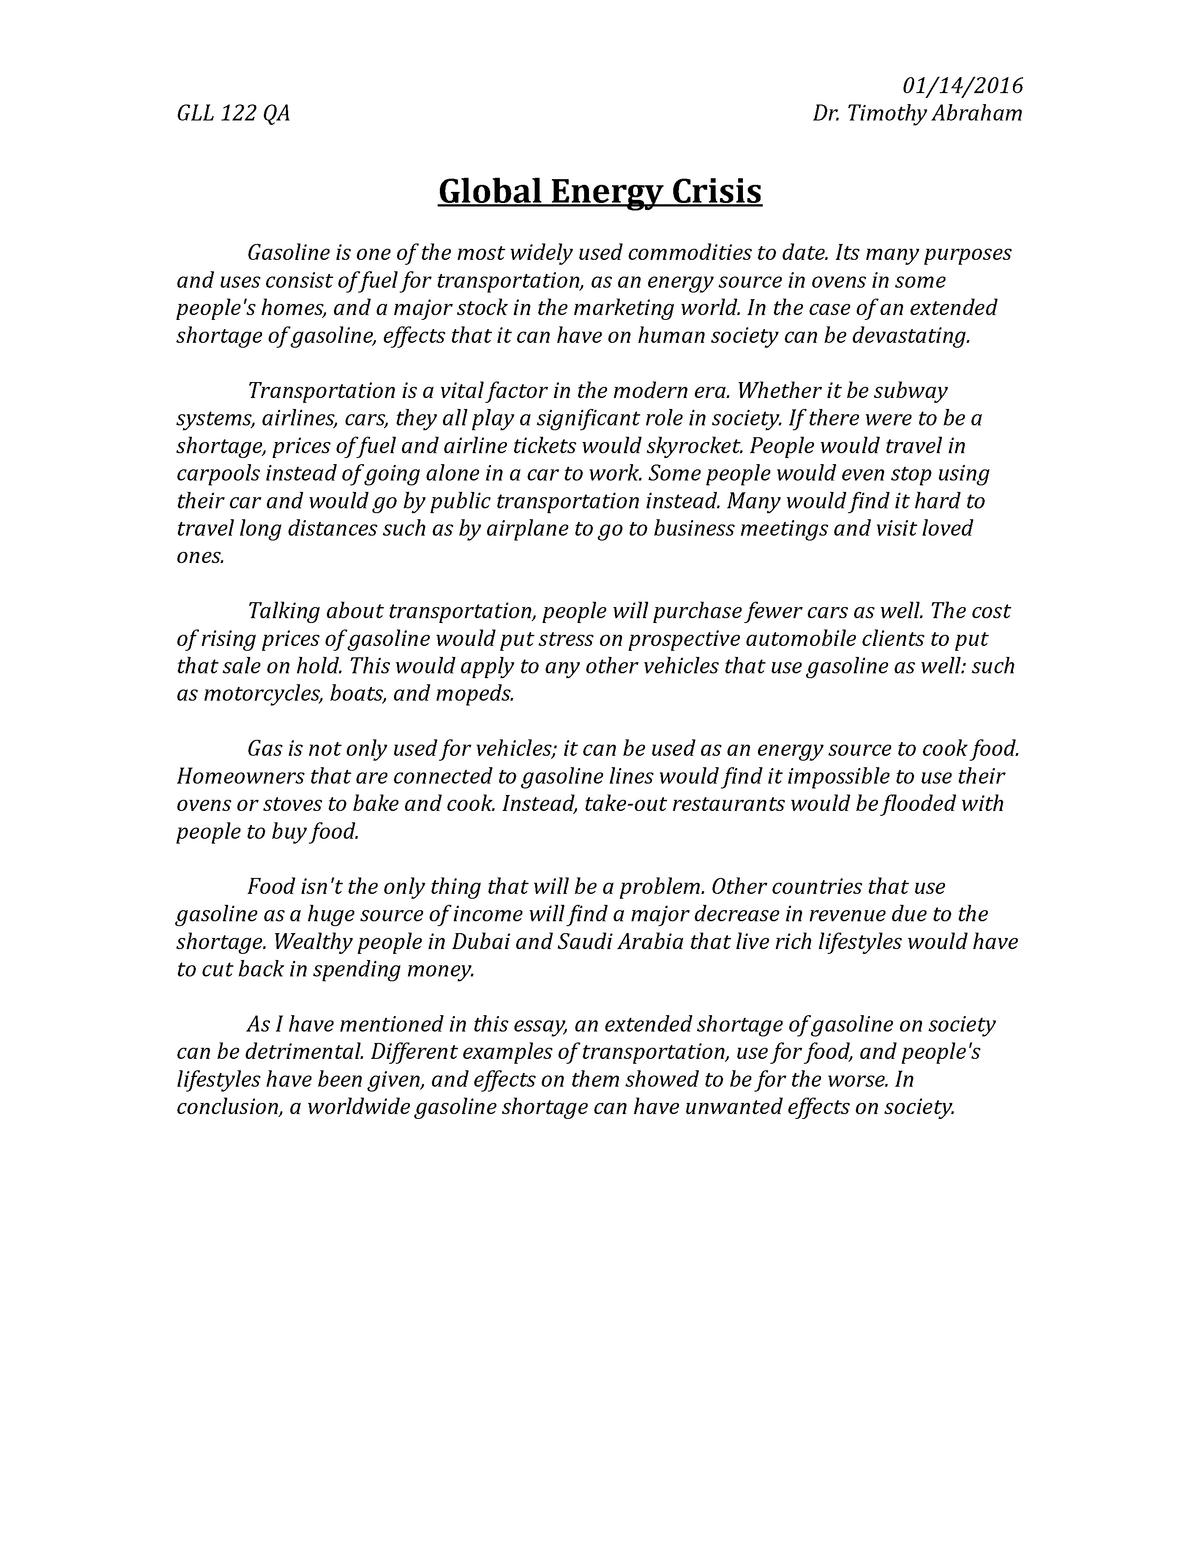 passage on energy